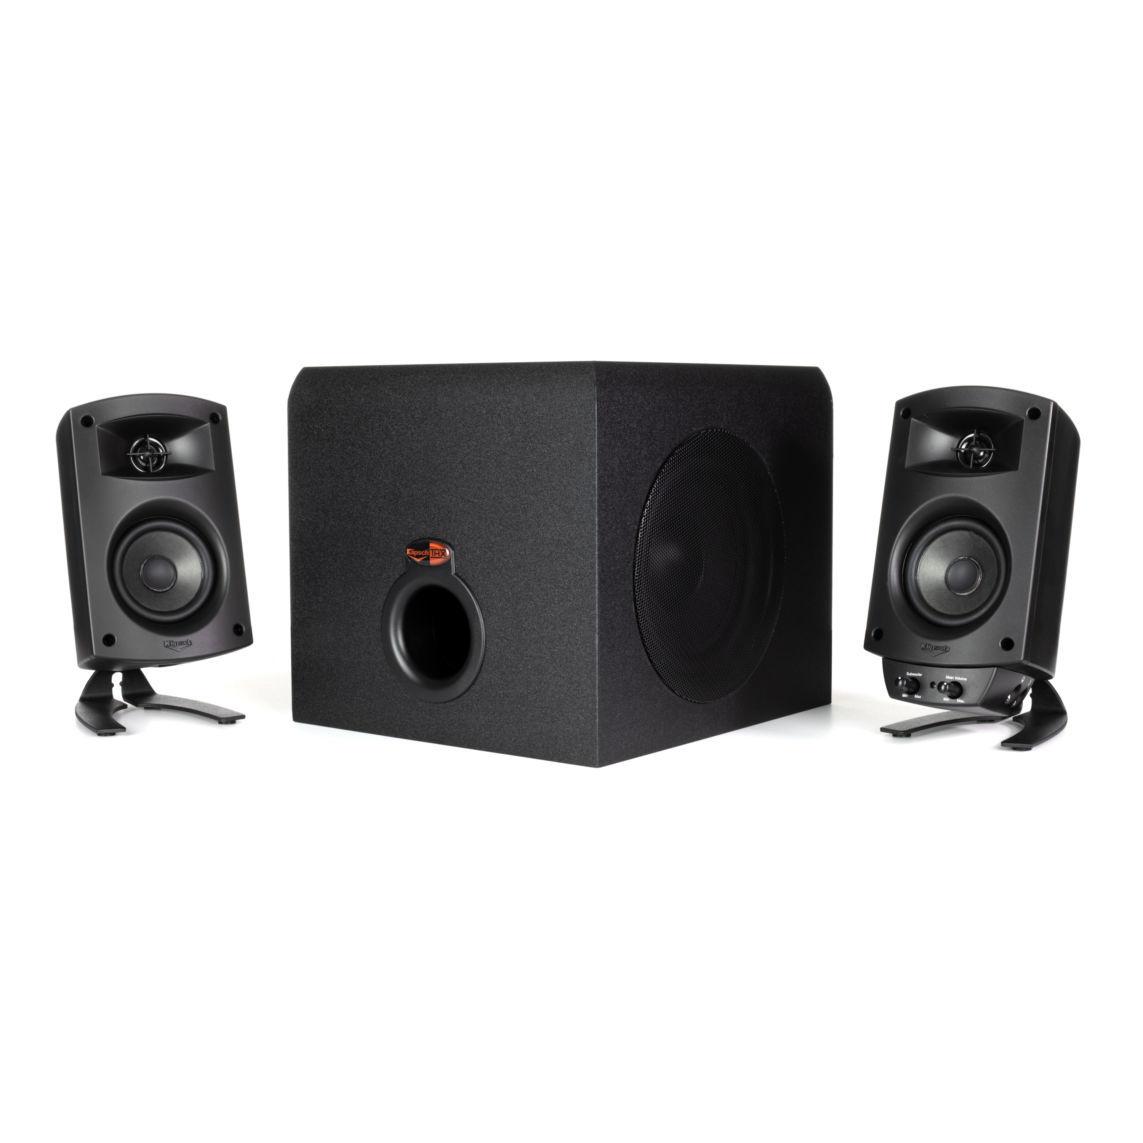 Klipsch ProMedia 2.1 THX Computer Speakers - Costco $139.99